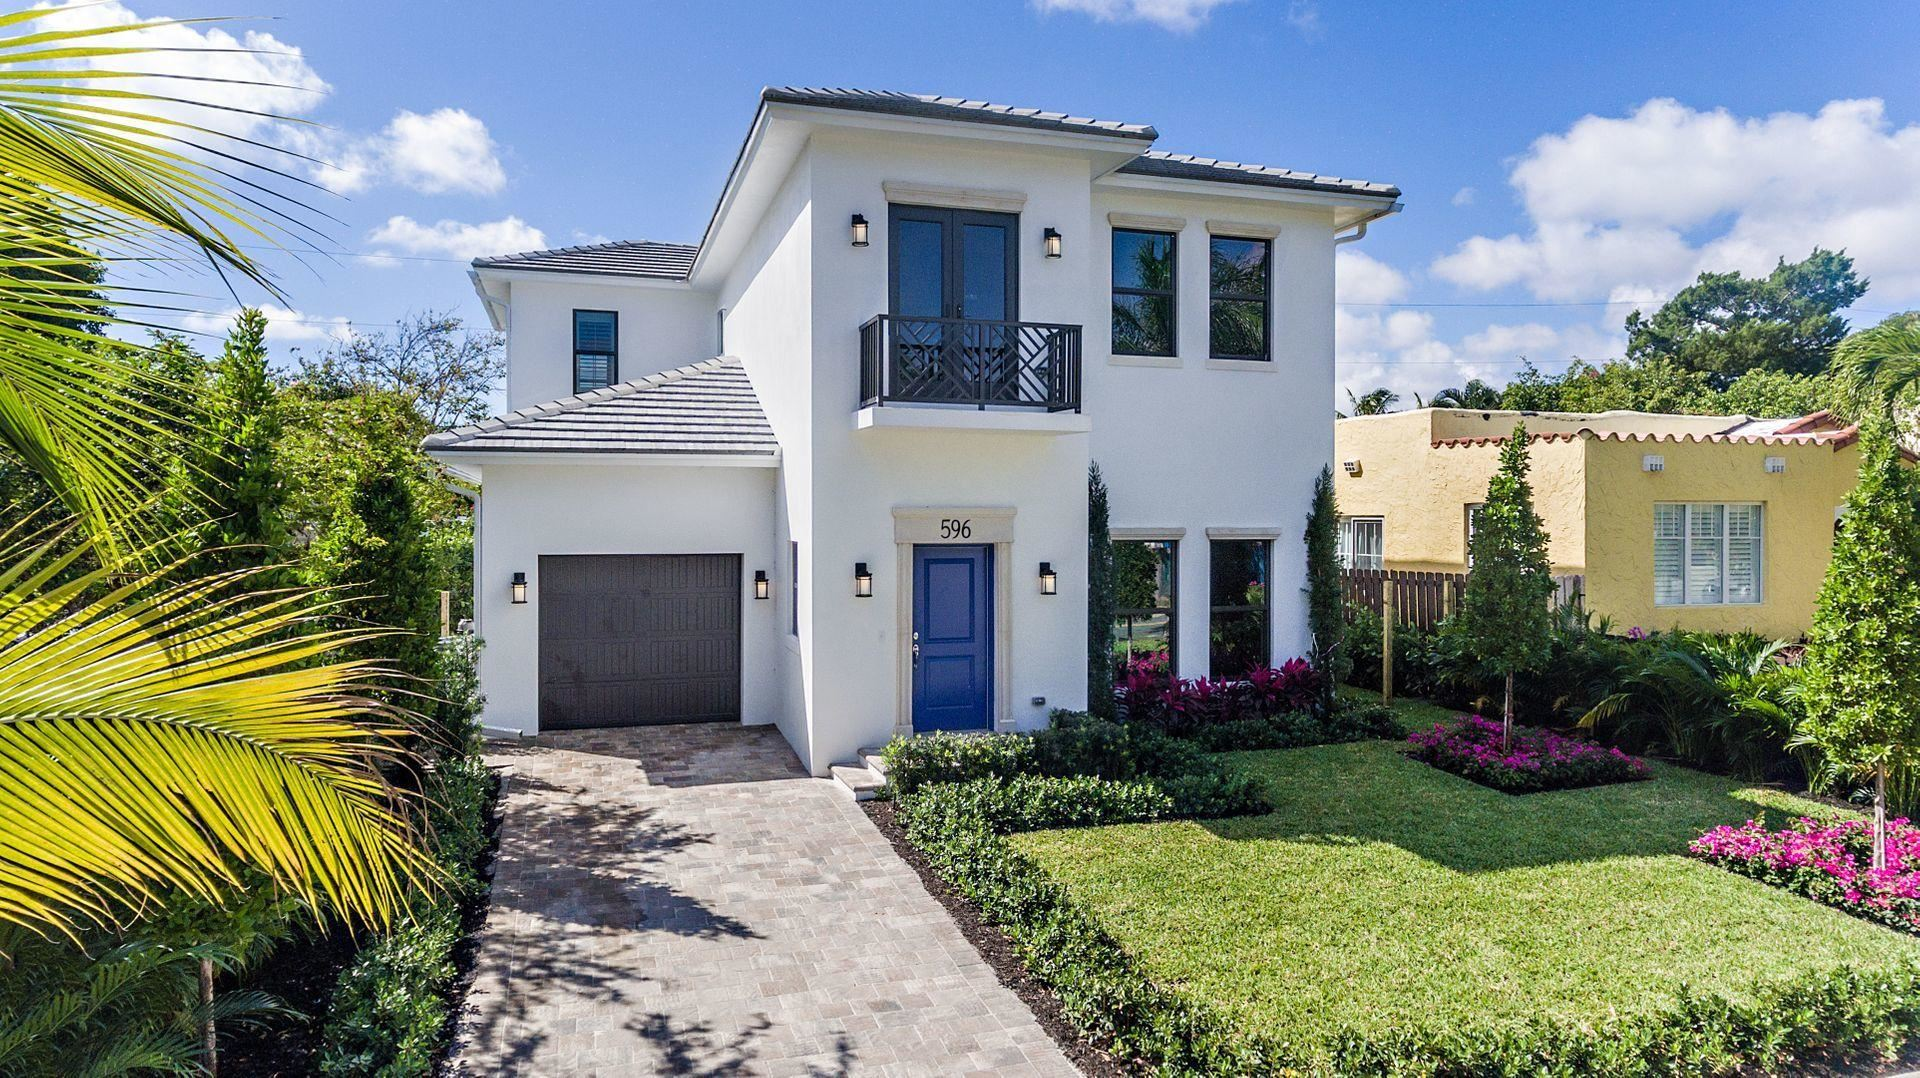 596 Ardmore Road, West Palm Beach, FL 33401 - #: RX-10610203